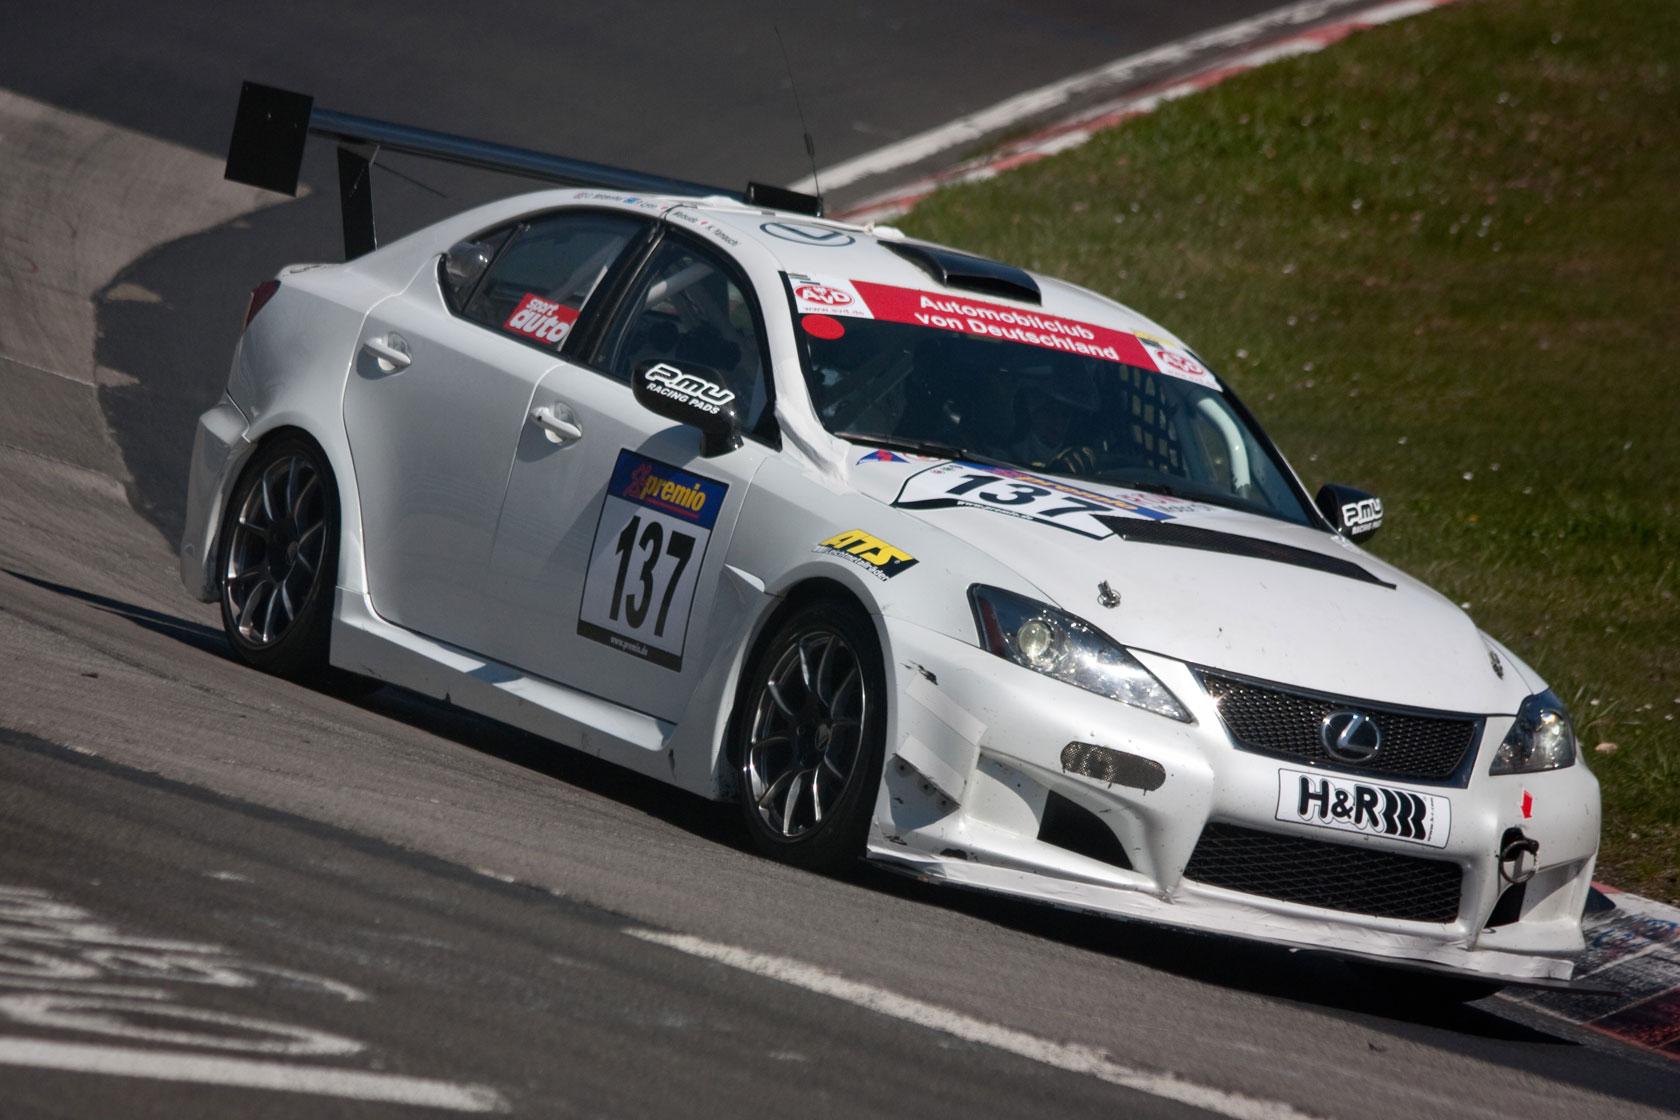 cars 54 lexus racing - photo #24